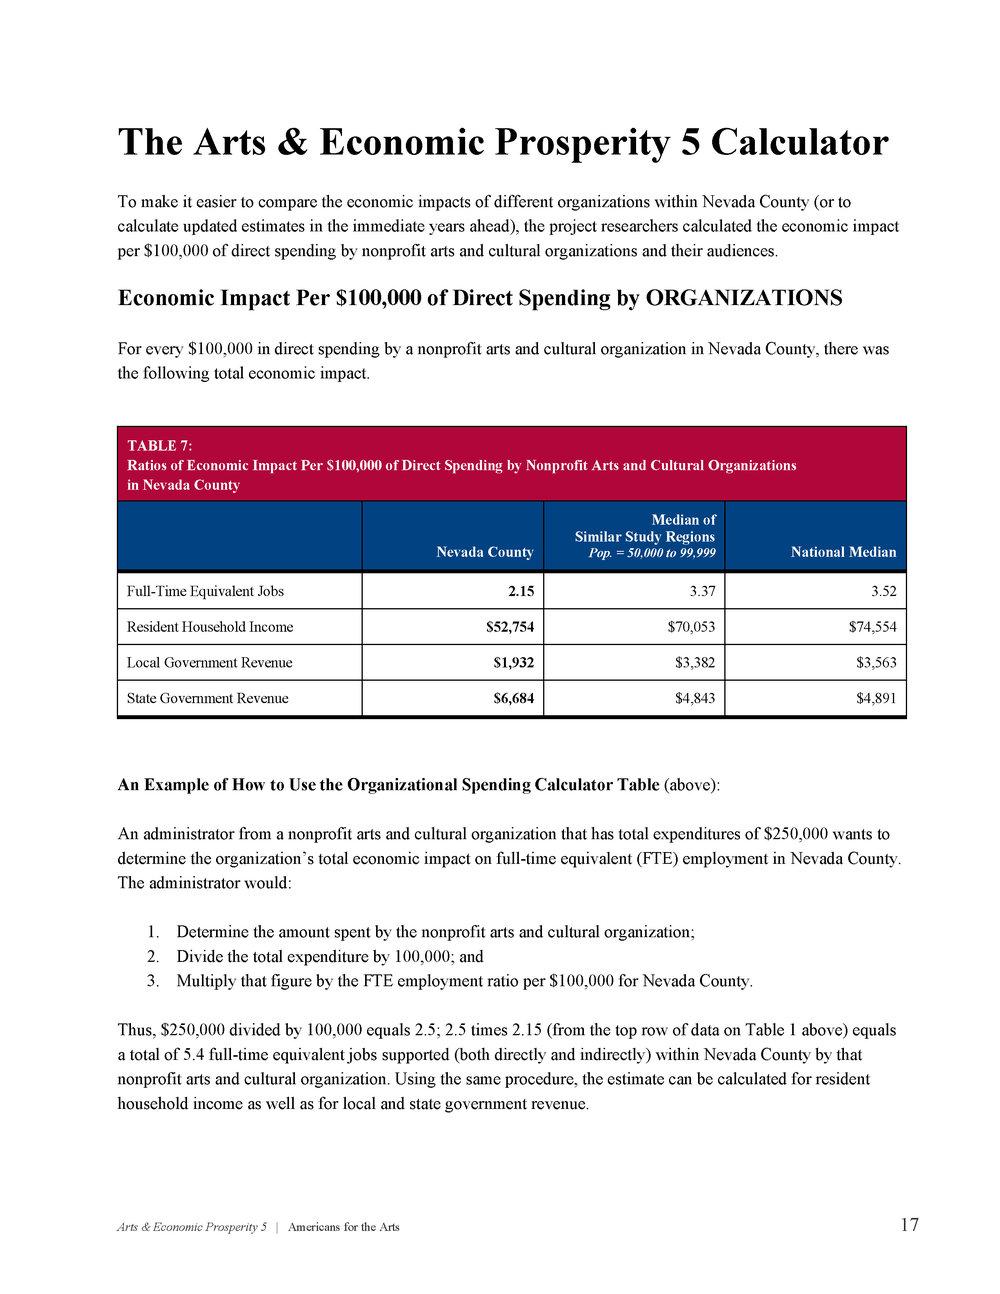 Arts & Economic Prosperity in Nevada County_Page_21.jpg